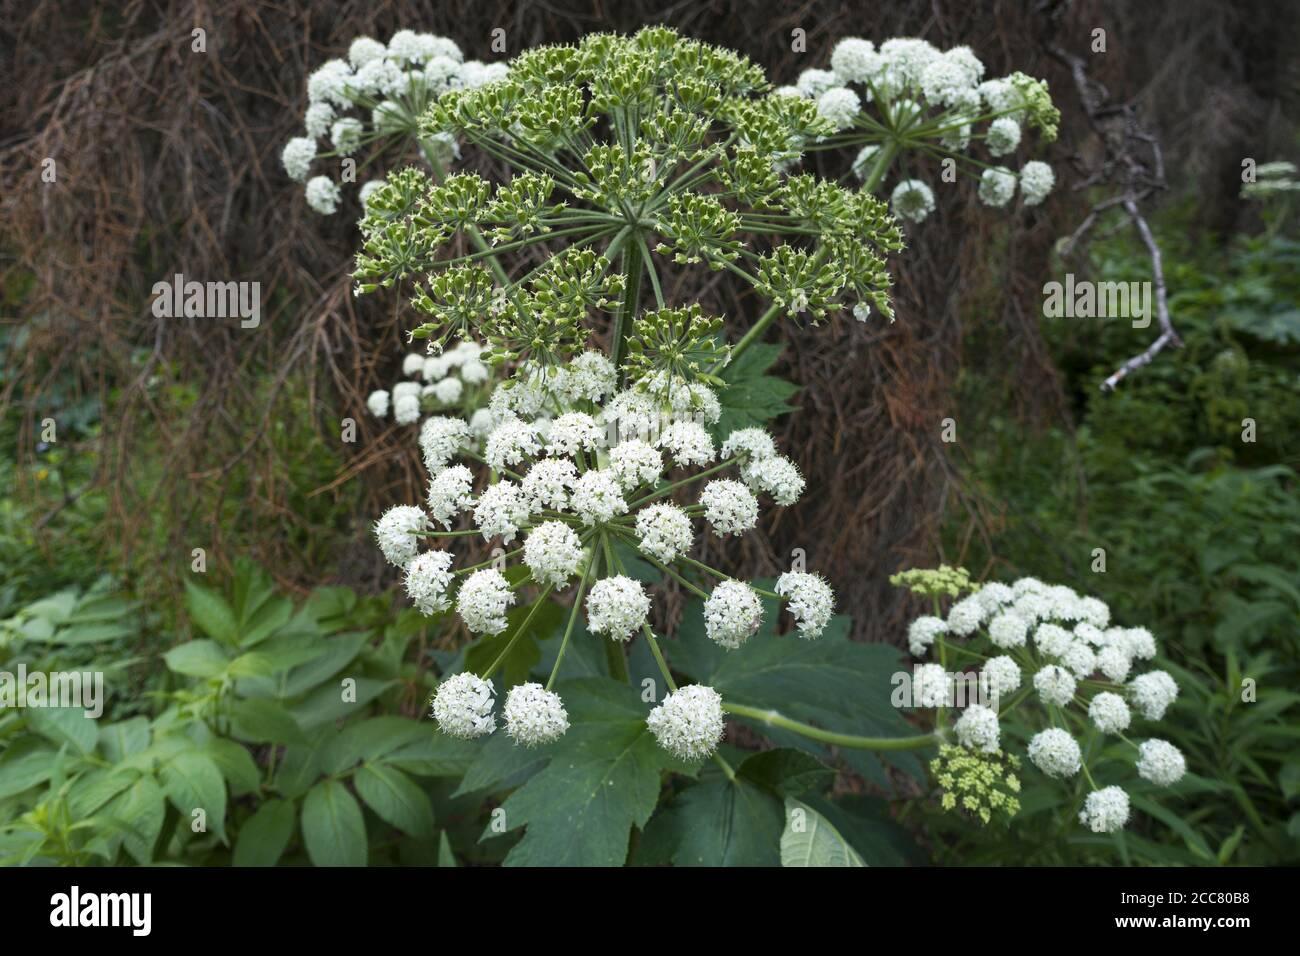 White Swamp Milkweed o Asclepias incarnata Close-up Macro, género de planta herbácea, perenne, floreciente que crece en el Parque Provincial BC Bosque Bush Foto de stock